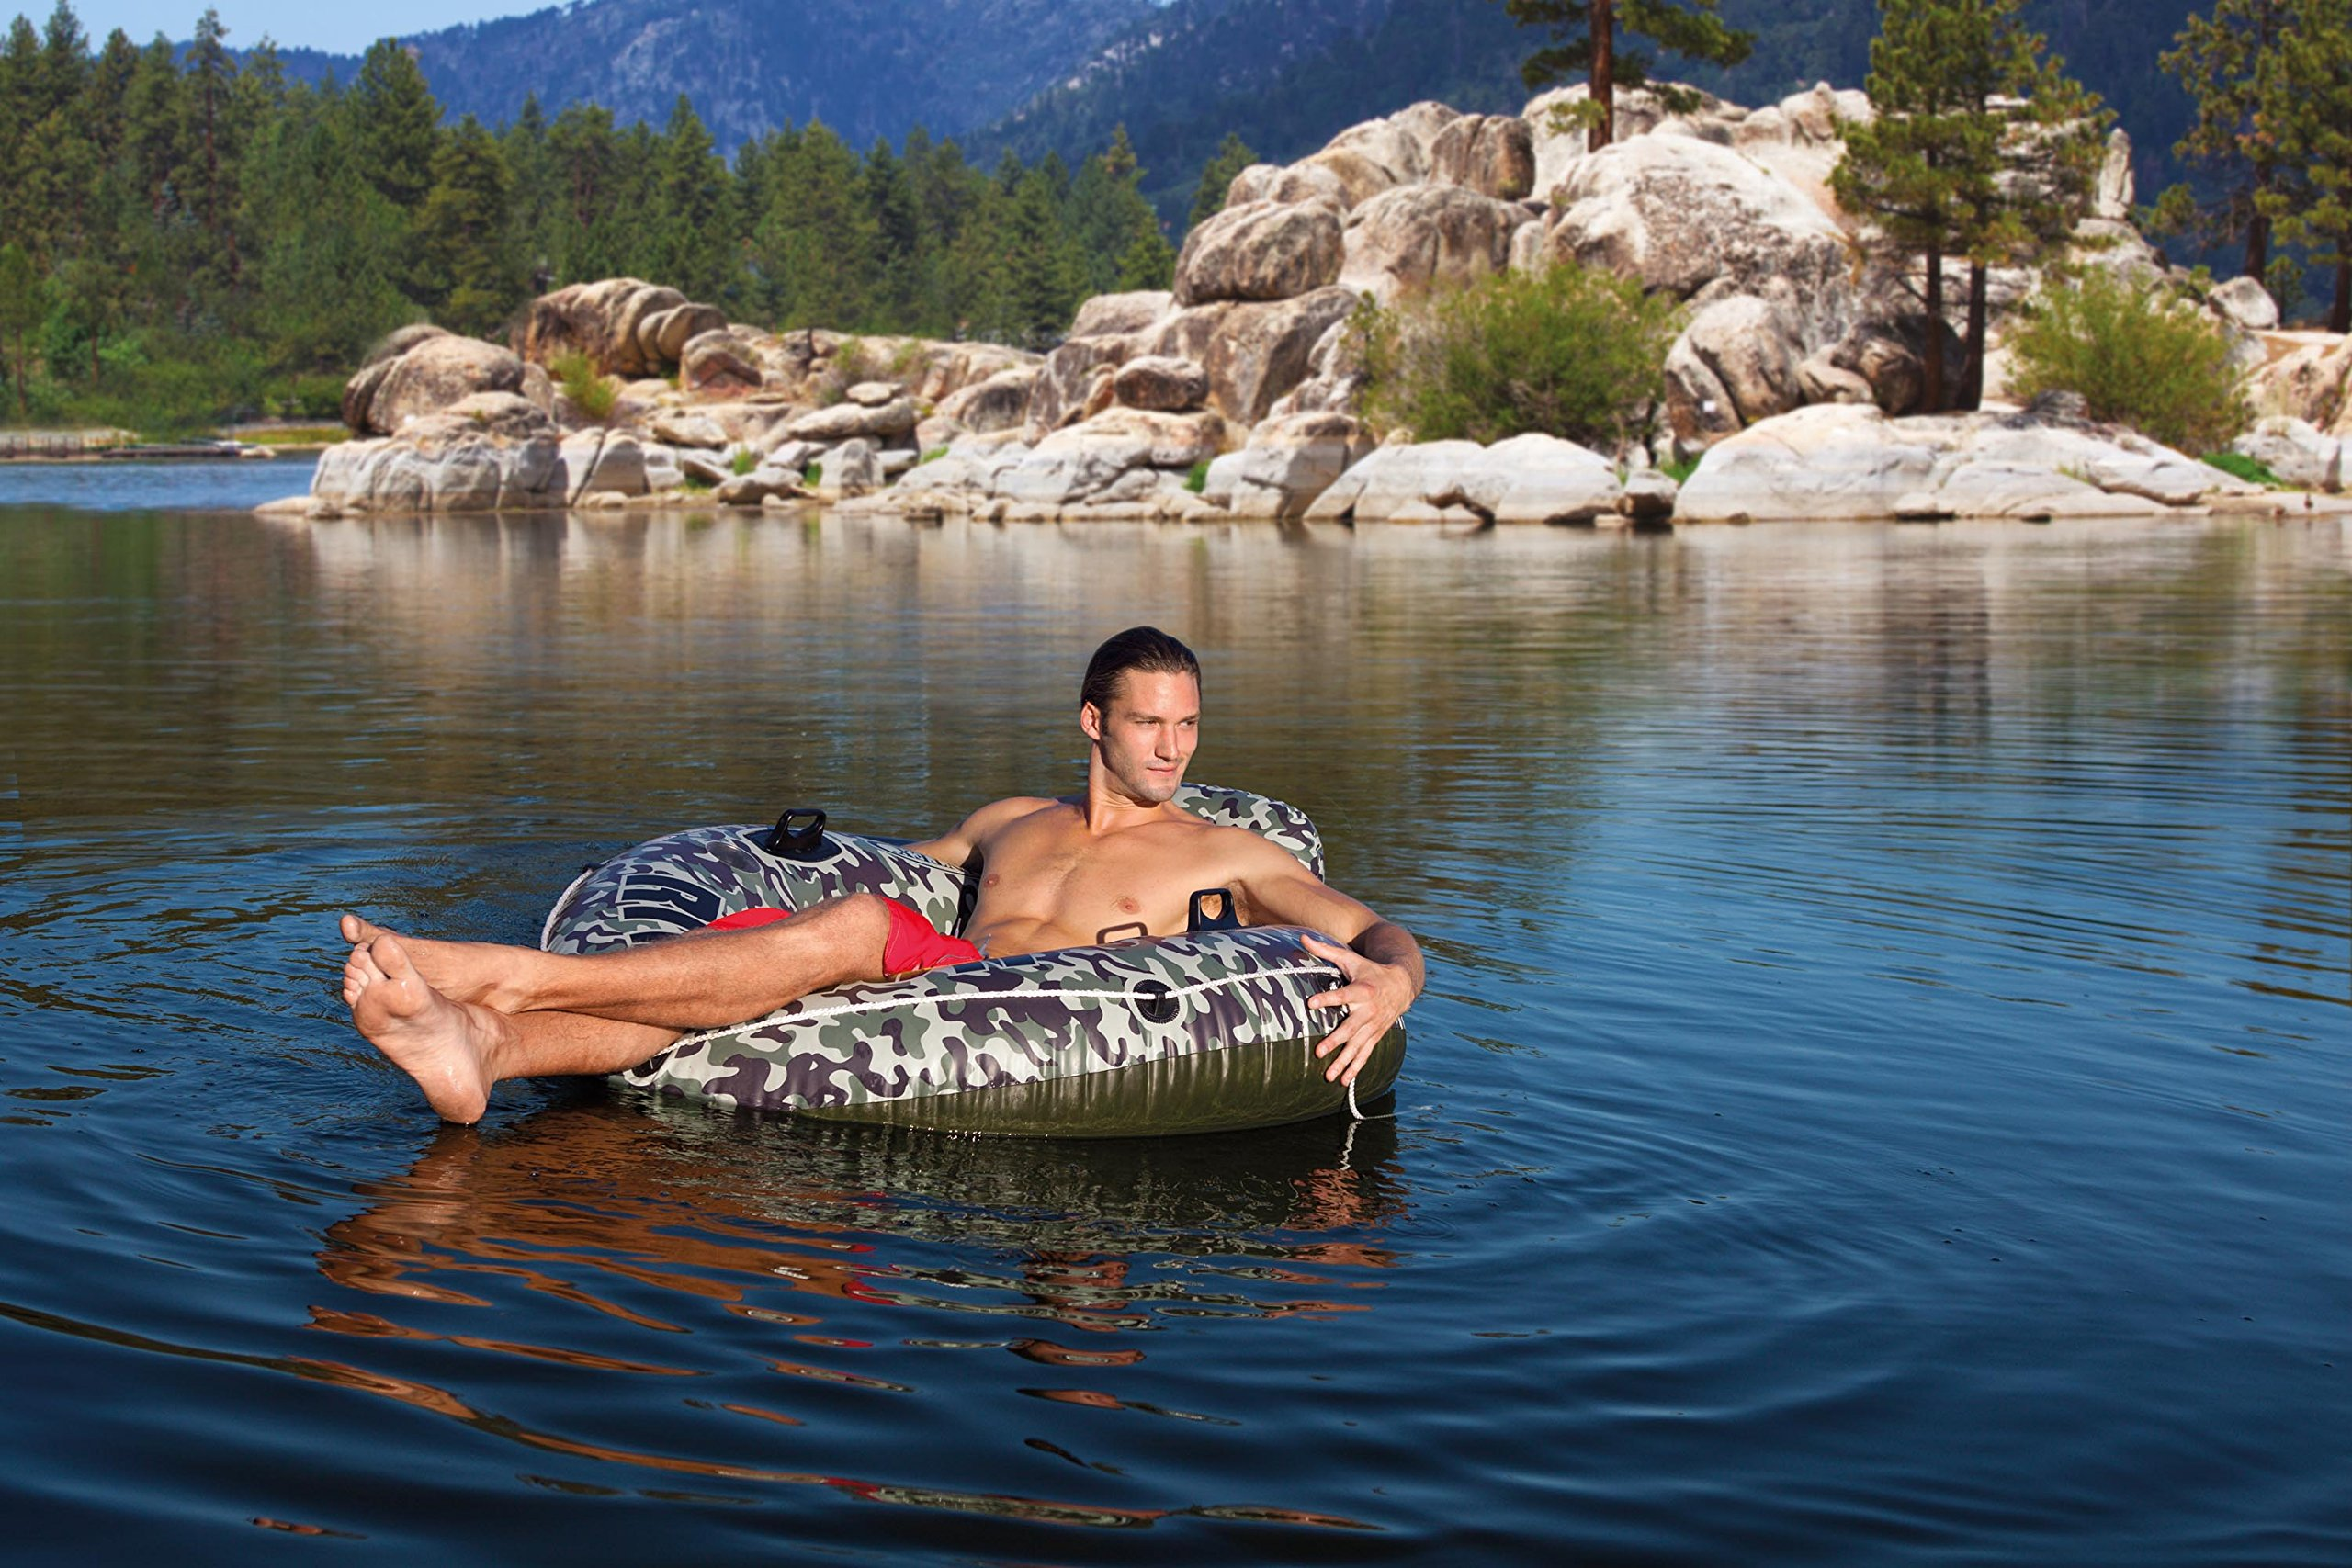 Intex Camo River Run I Inflatable Floating Tube Raft (2 Pack) | 58835EP by Intex (Image #4)